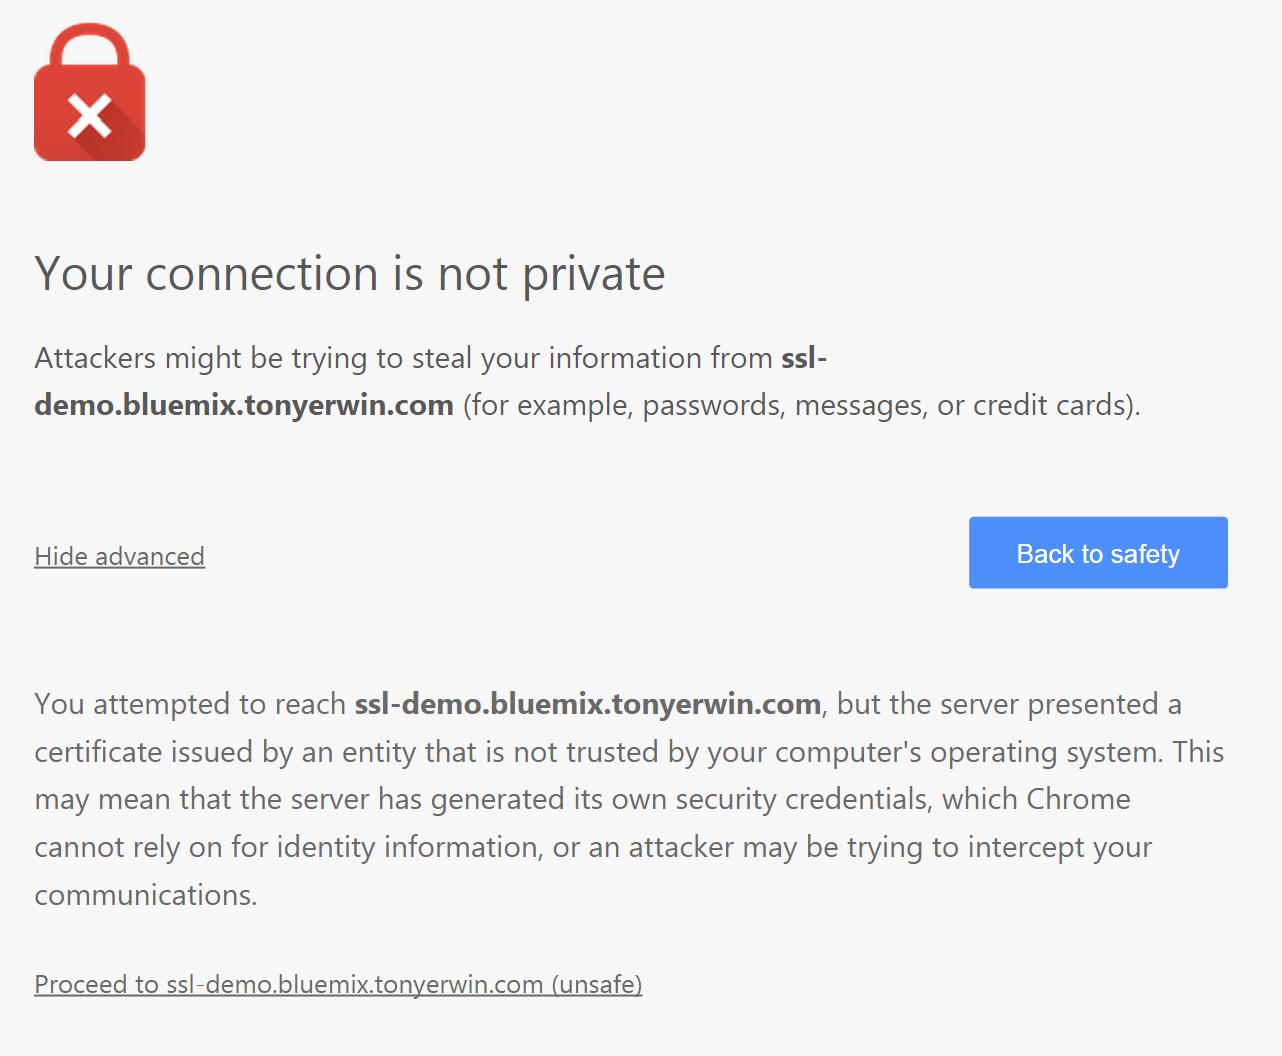 Bluemix UI: Chrome Warning Non-Trusted